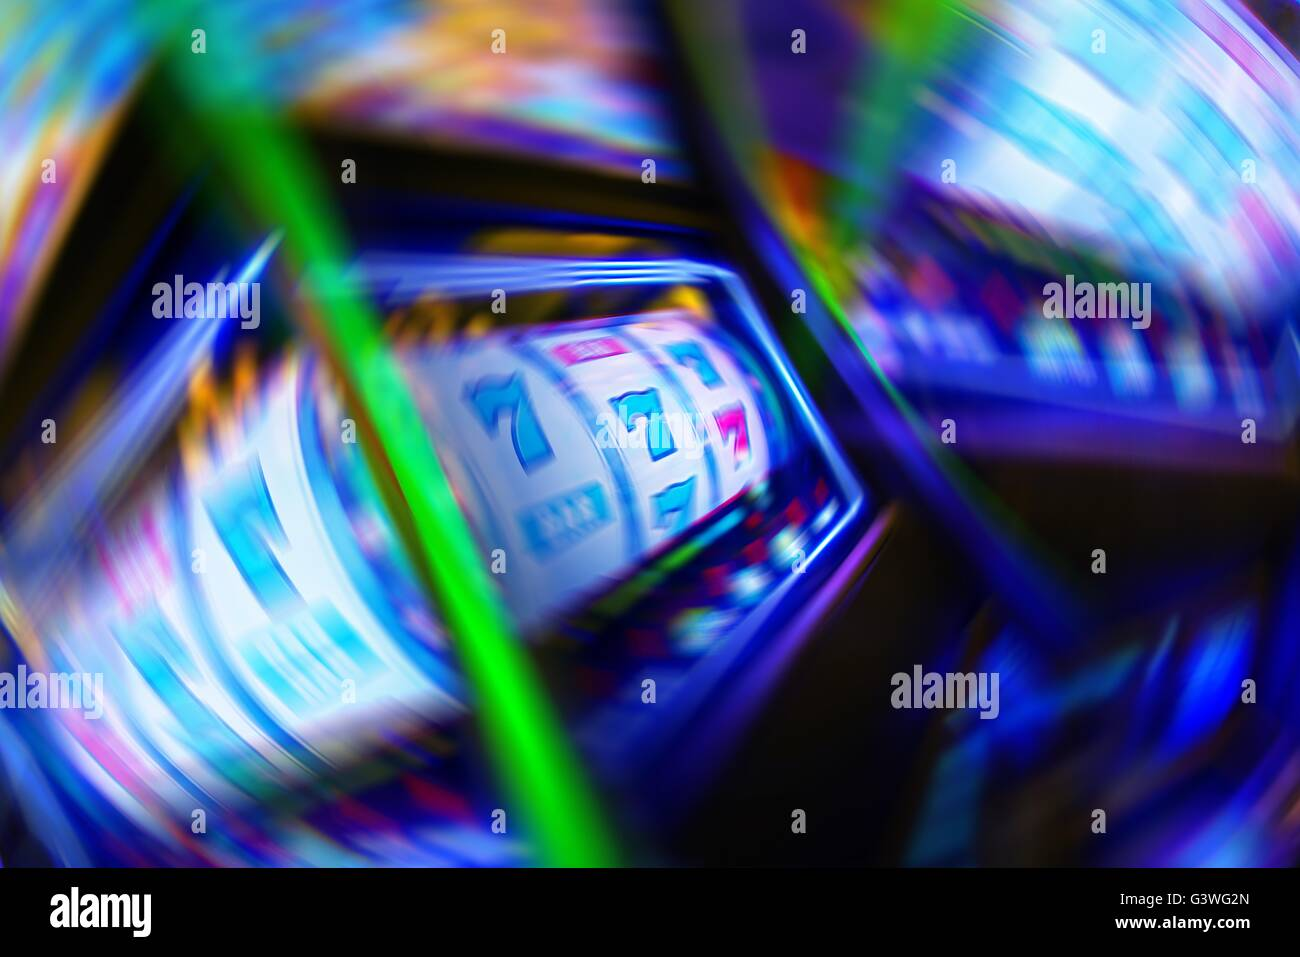 Casino Gambling Obsession Conceptual Illustration. - Stock Image